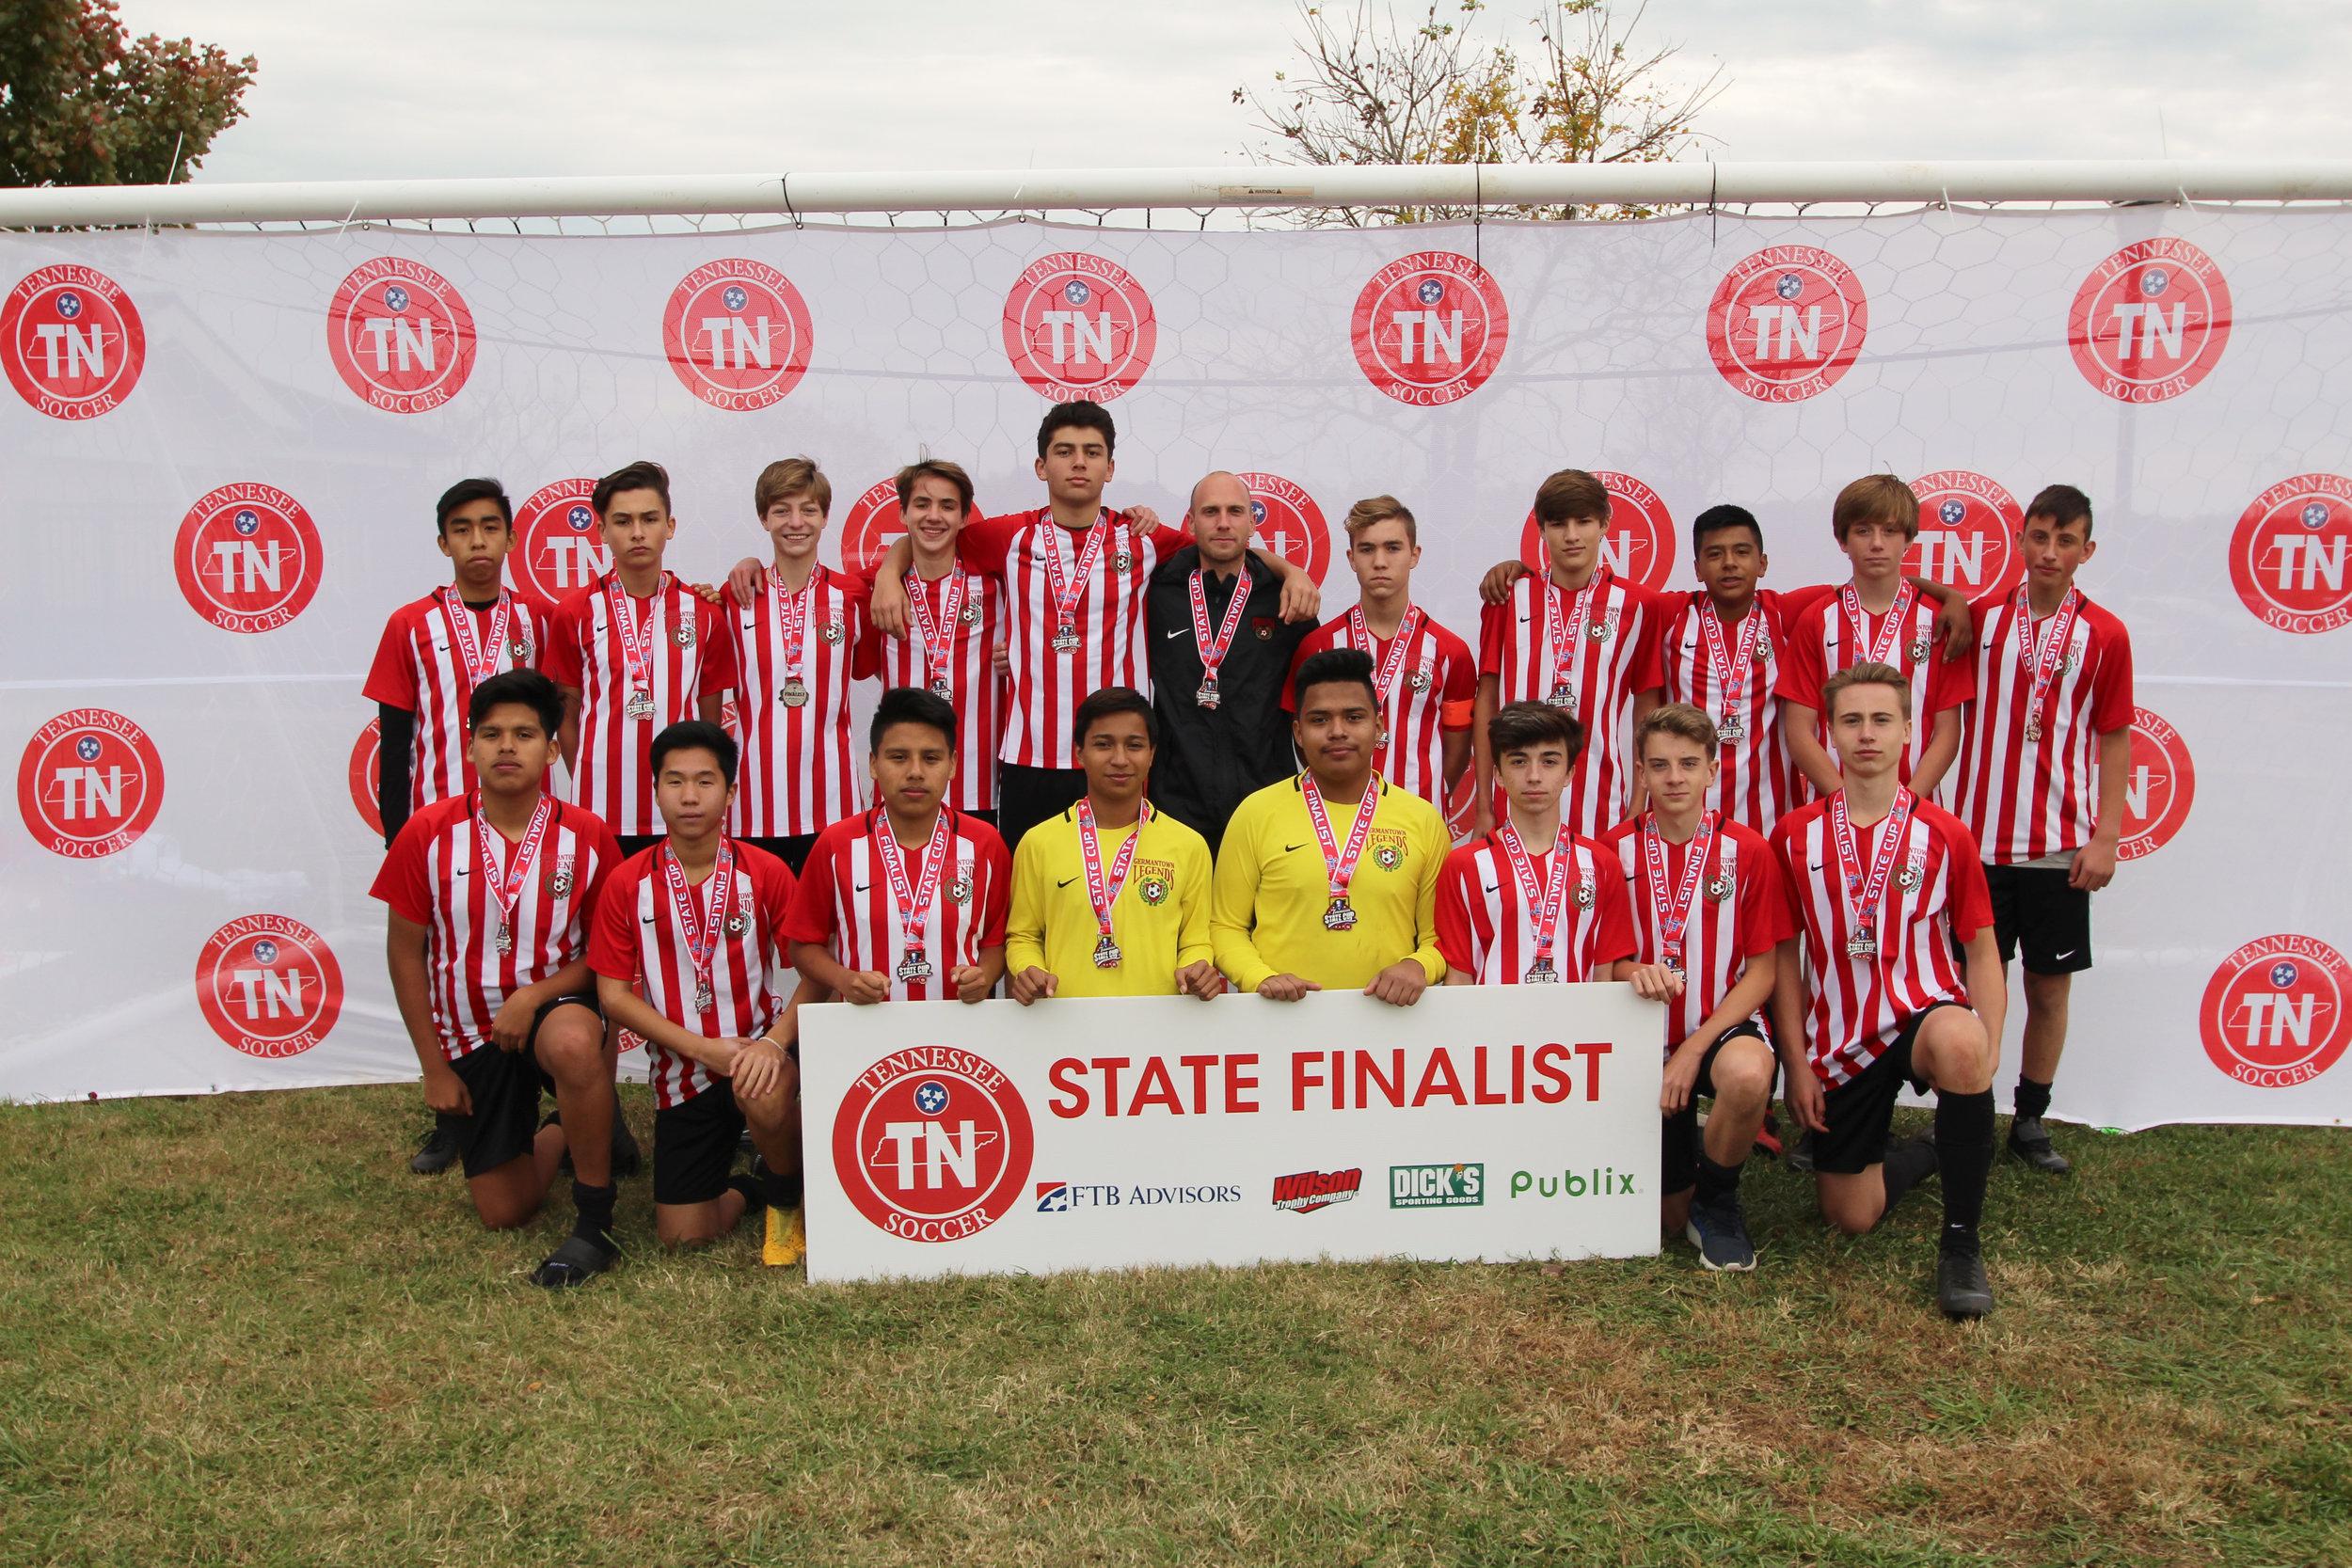 D2 U16 Boys Finalist - Germantown Legends 03 White